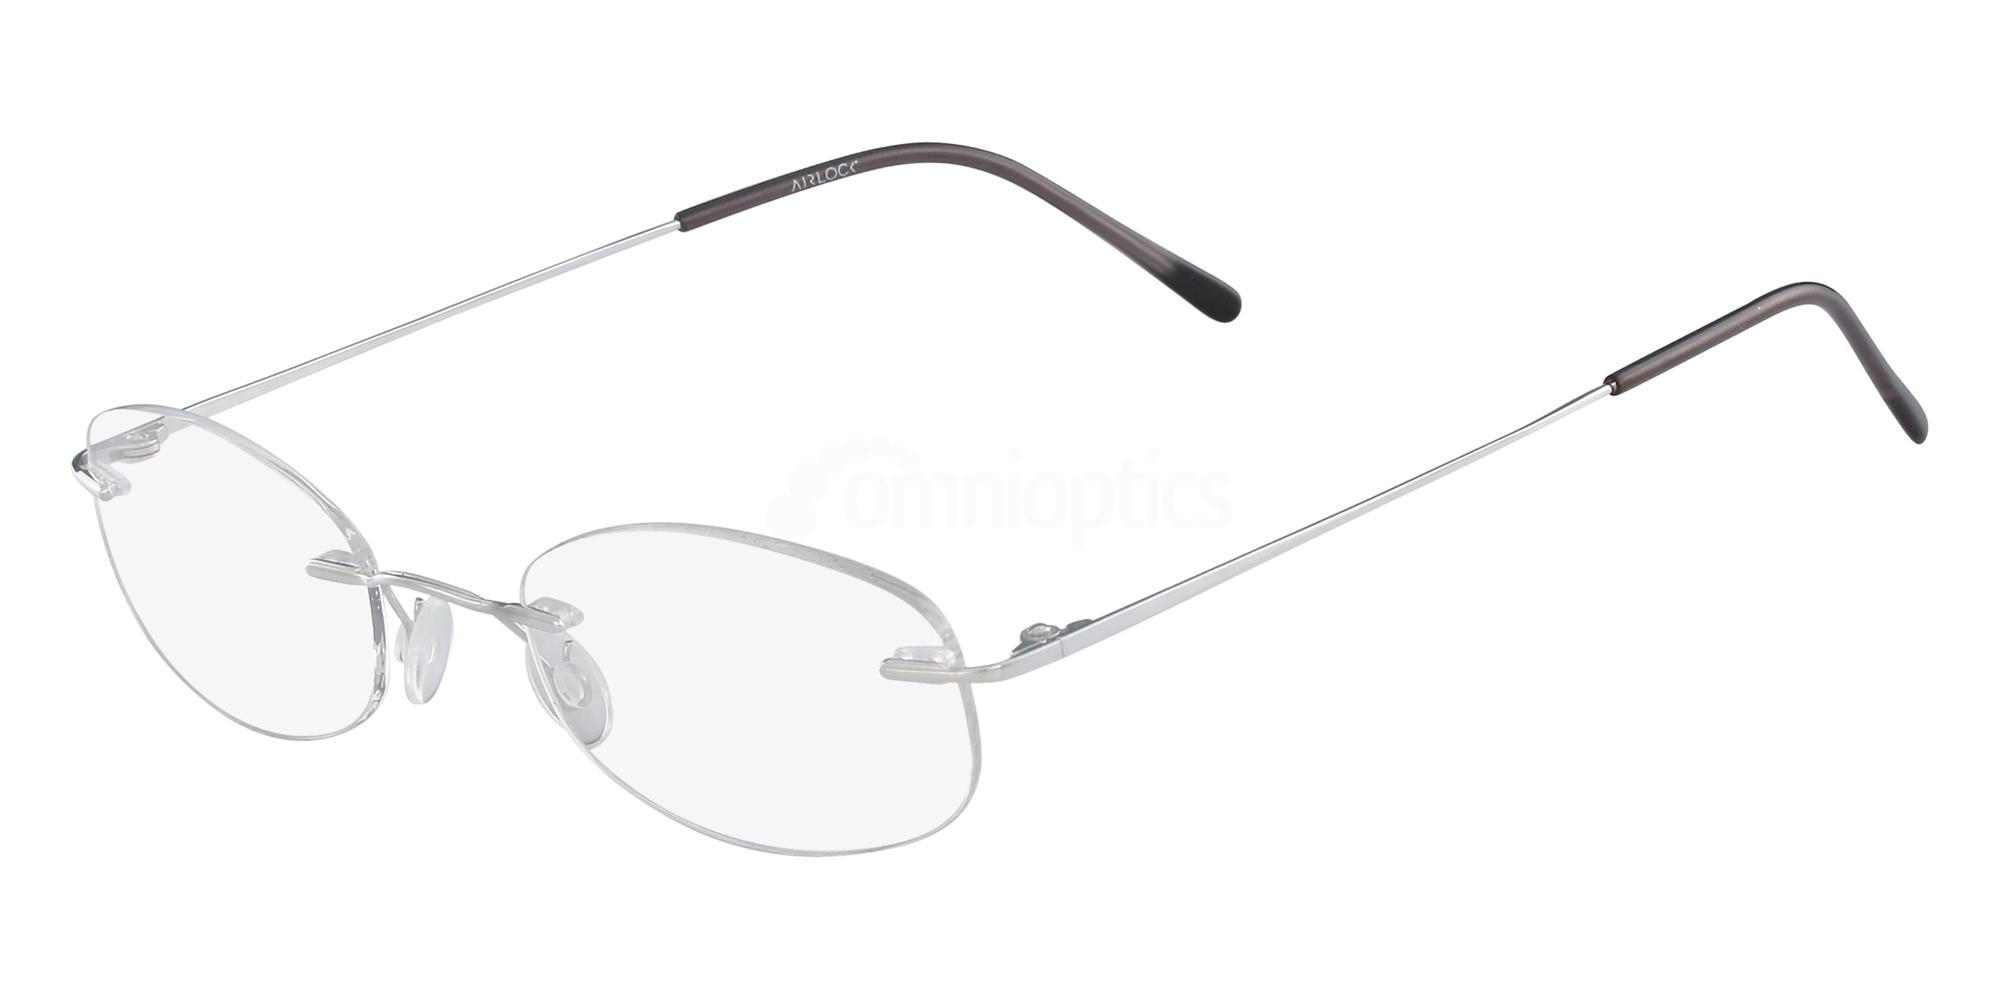 046 SEVEN-SIXTY 205 Glasses, AIRLOCK